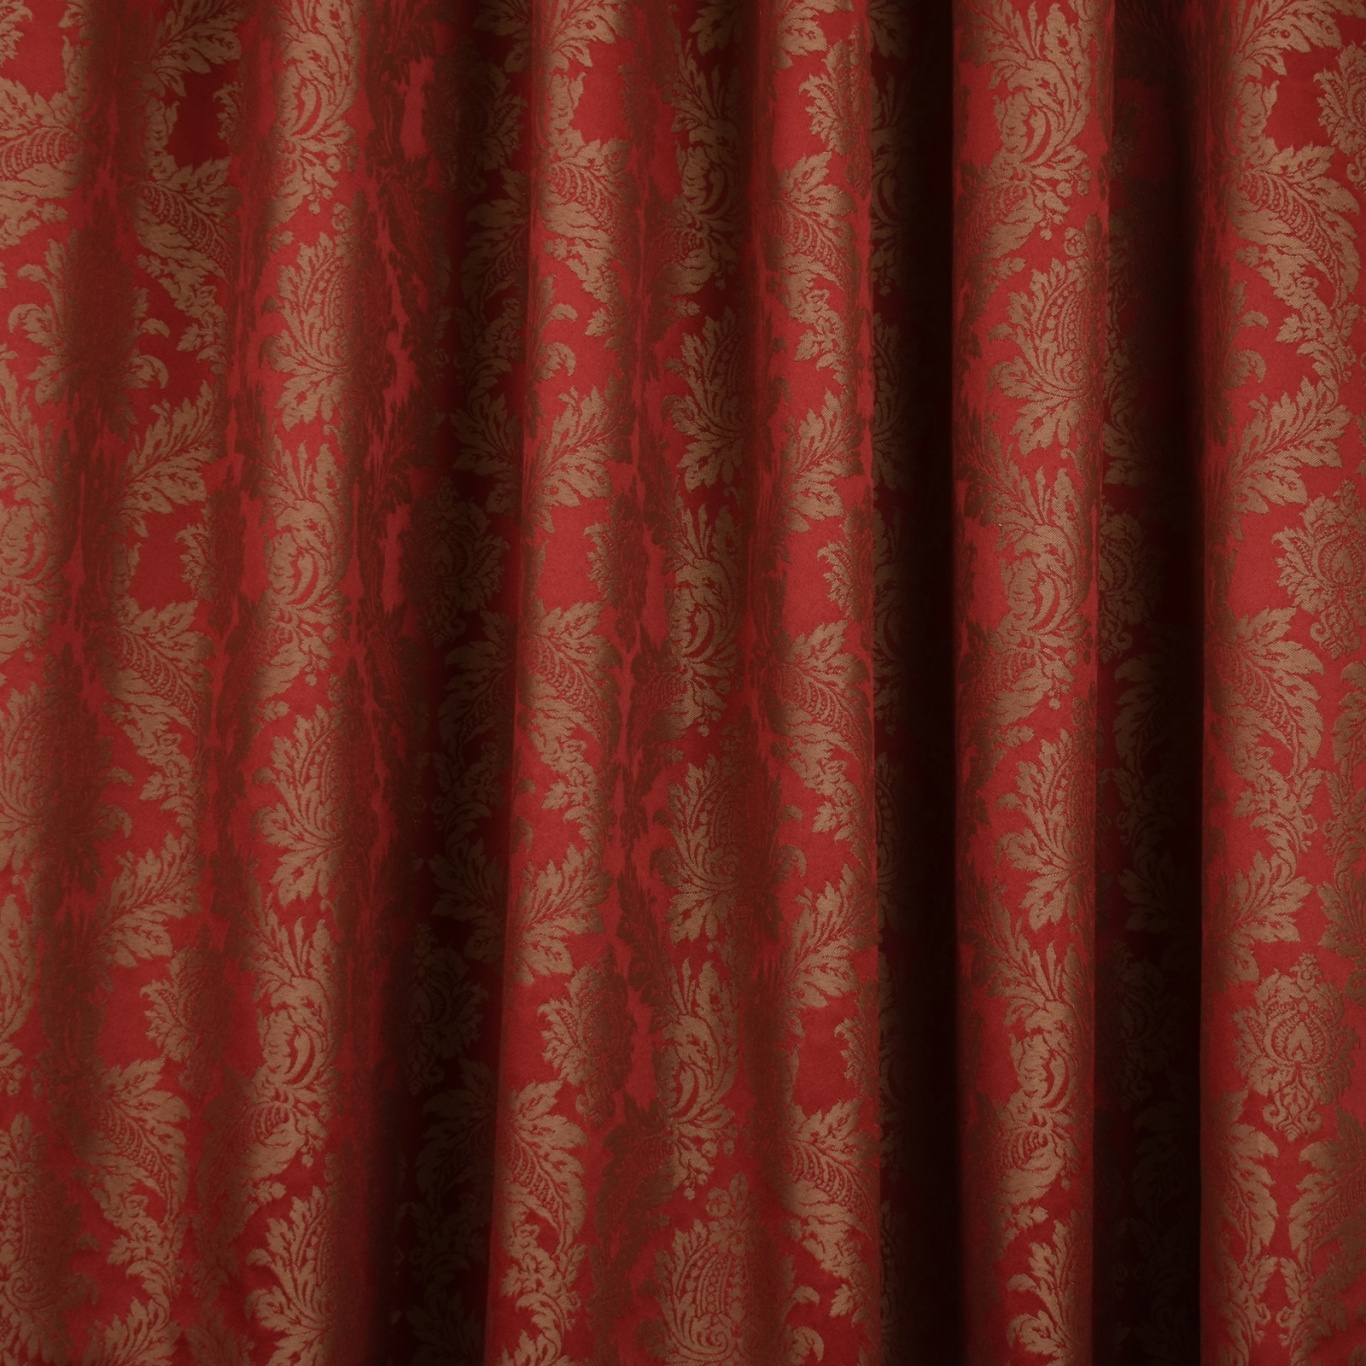 Gordon Smith Damask Red Fabric